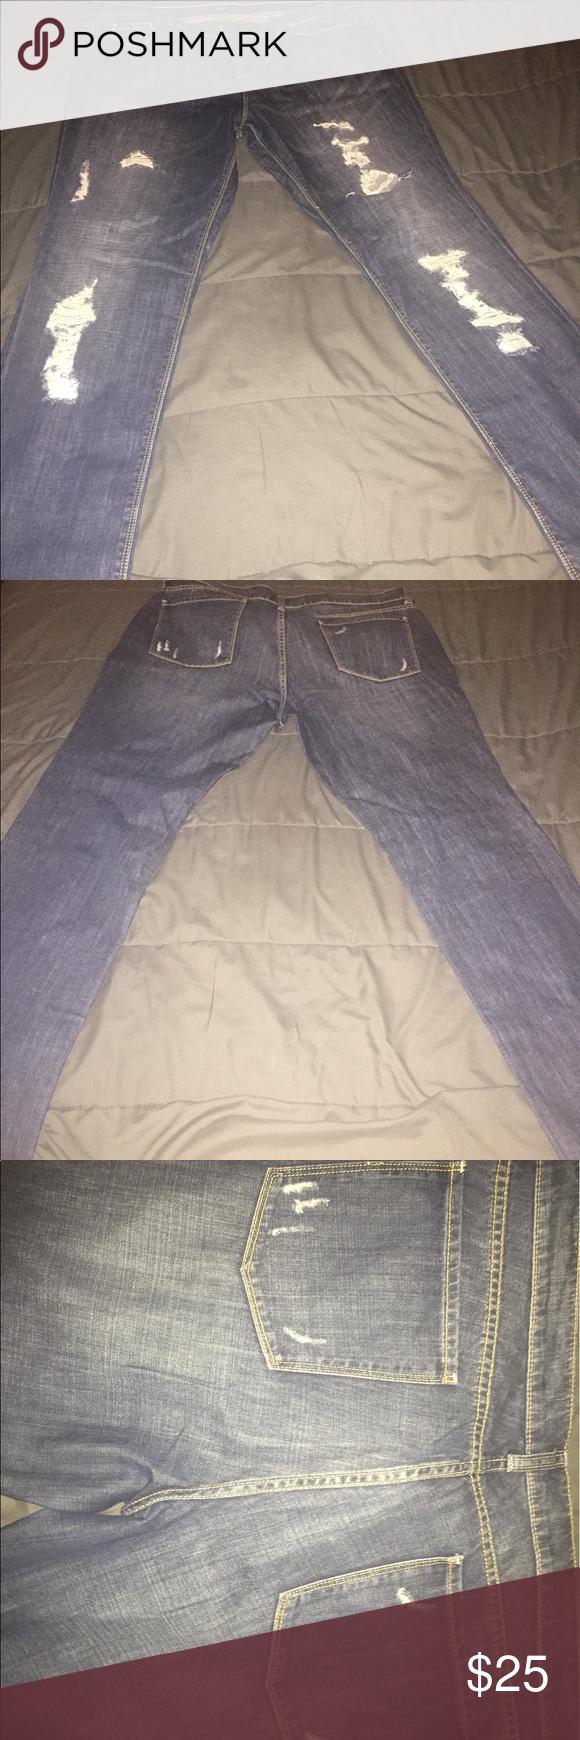 London Jean (Victoria's Secret) distressed jeans Distressed jeans. Never worn! Victoria's Secret Jeans Straight Leg